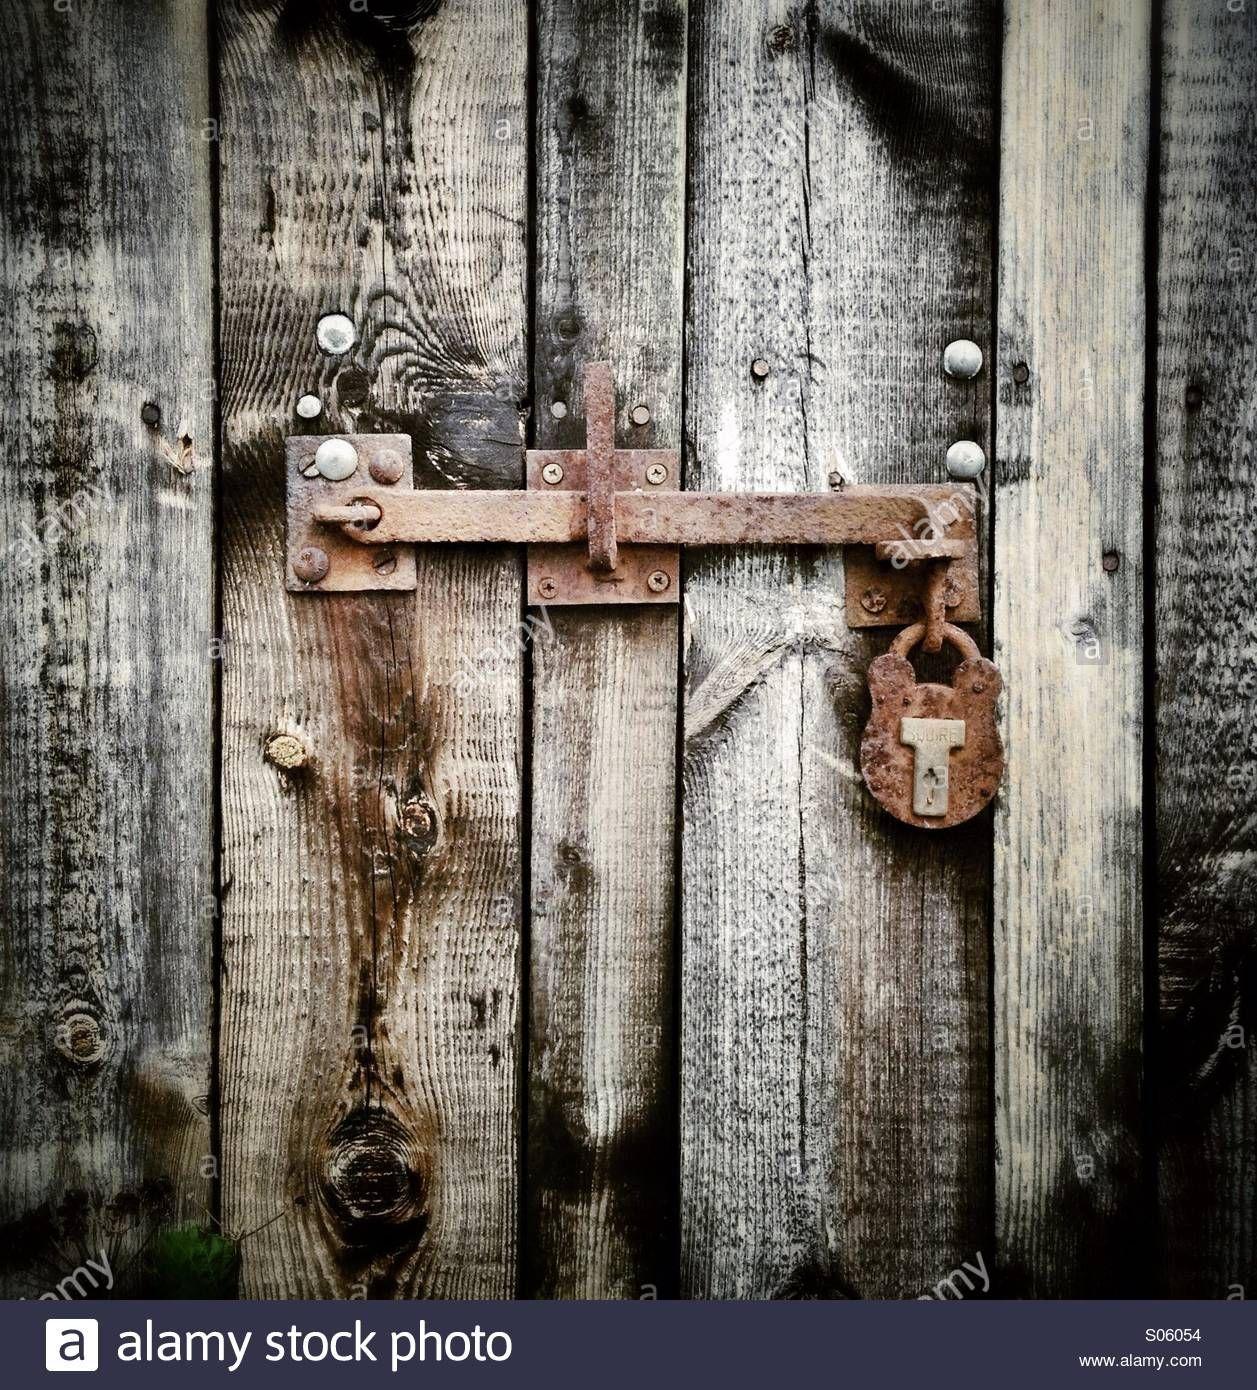 Rusty Bolt And Padlock On An Old Barn Door Stock Photo Old Barn Doors Barn Door Barn Door Locks